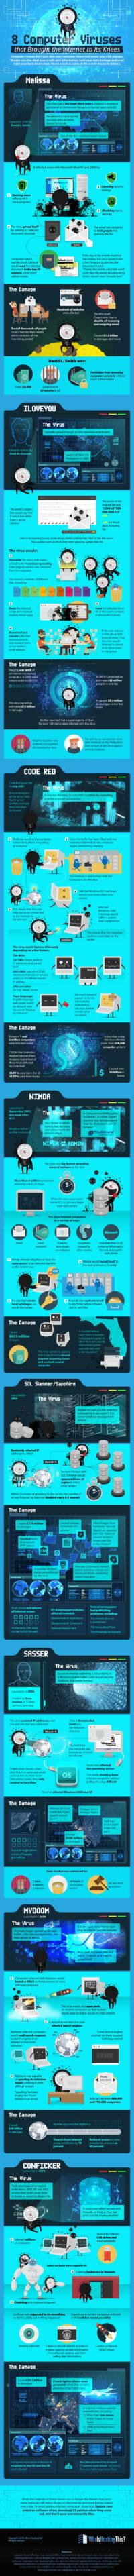 les-8-pires-virus-internet Infographie : 8 virus qui ont fait trembler Internet